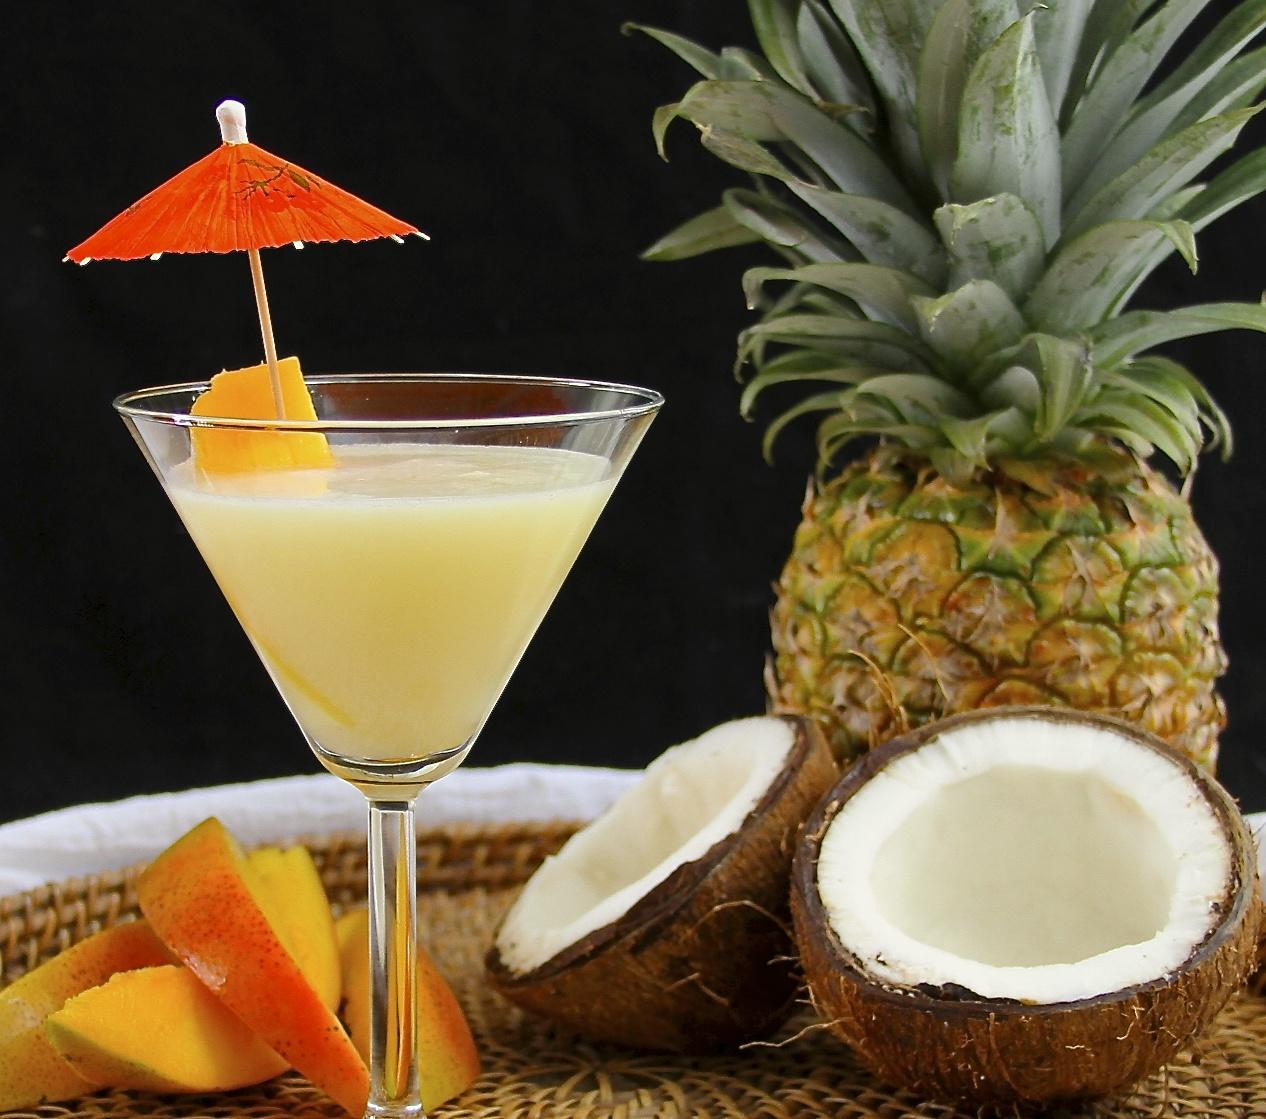 Coconut Mango: I'm Bored, Let's Go